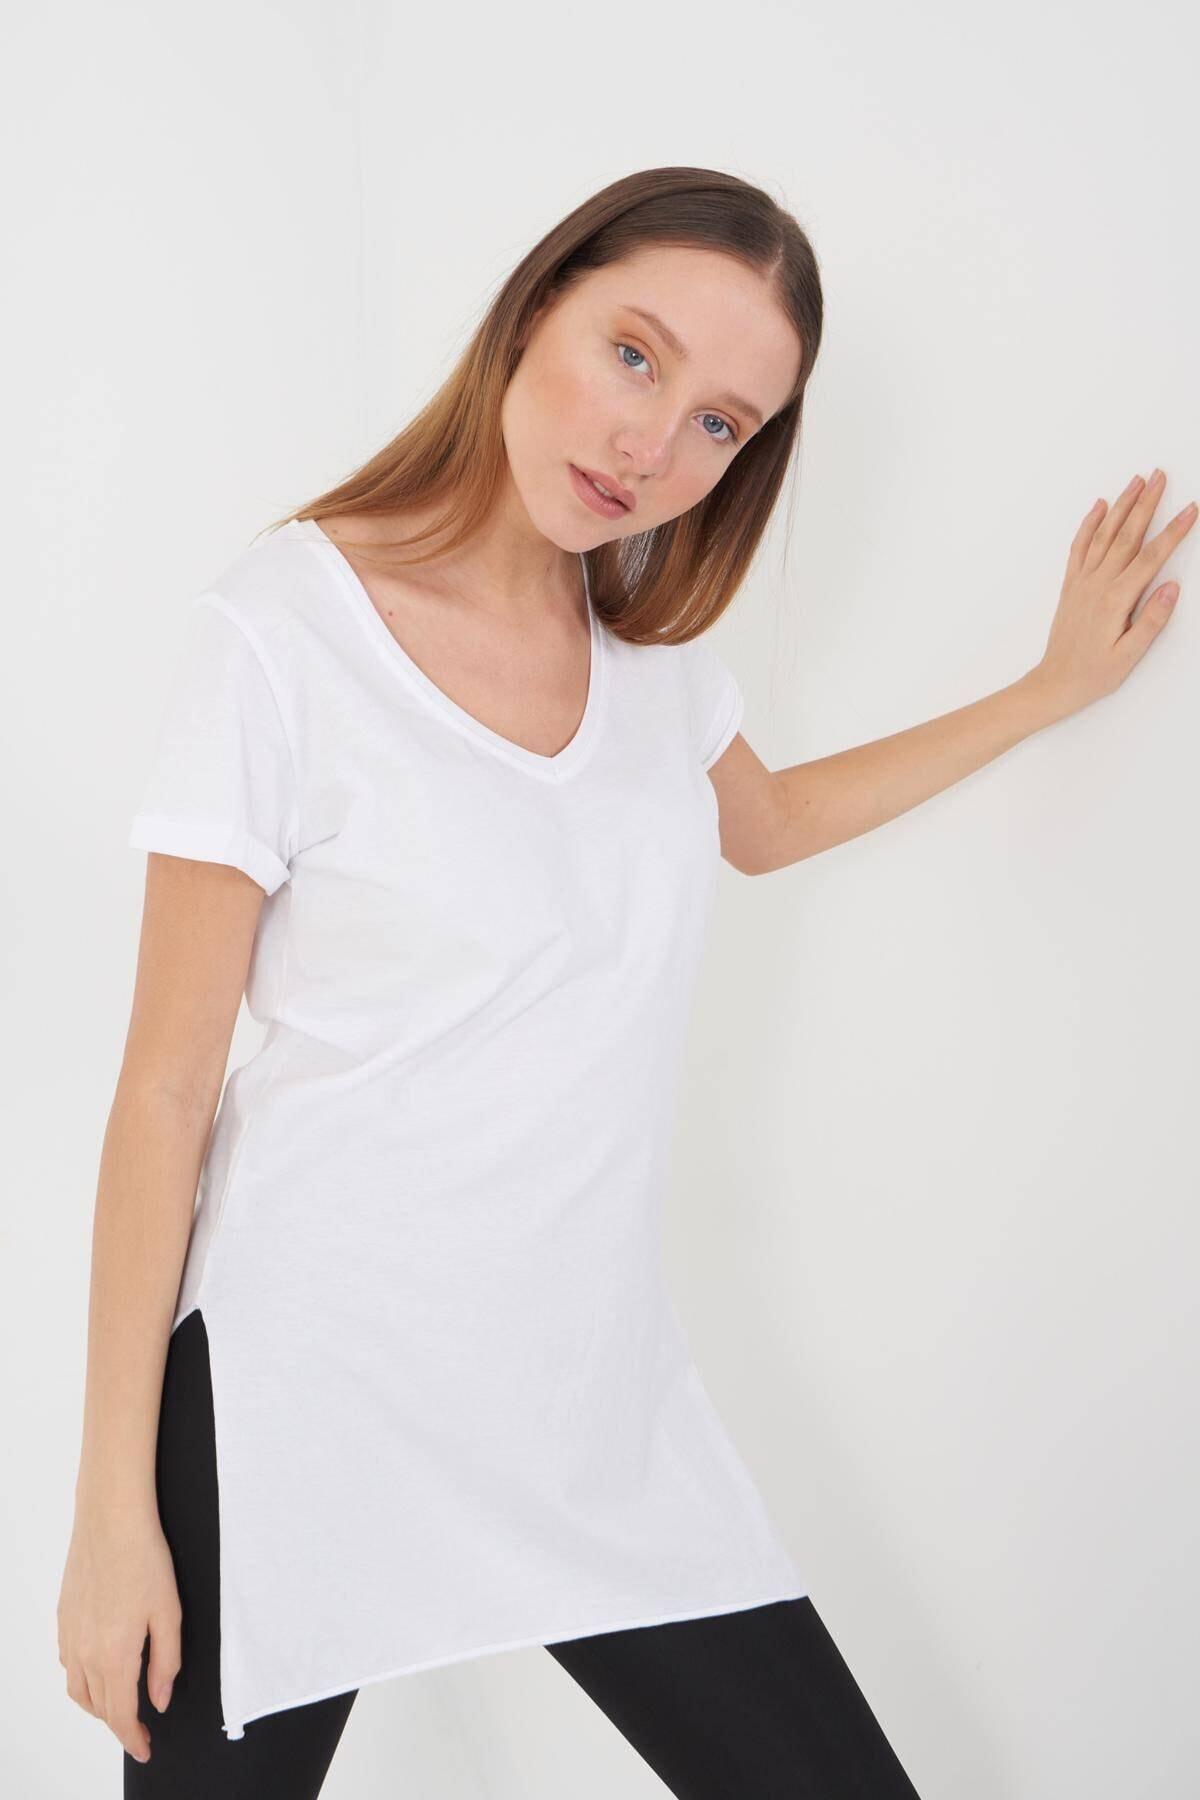 Addax Kadın Beyaz V Yaka T-Shirt P0102 - U1 Adx-00007205 2